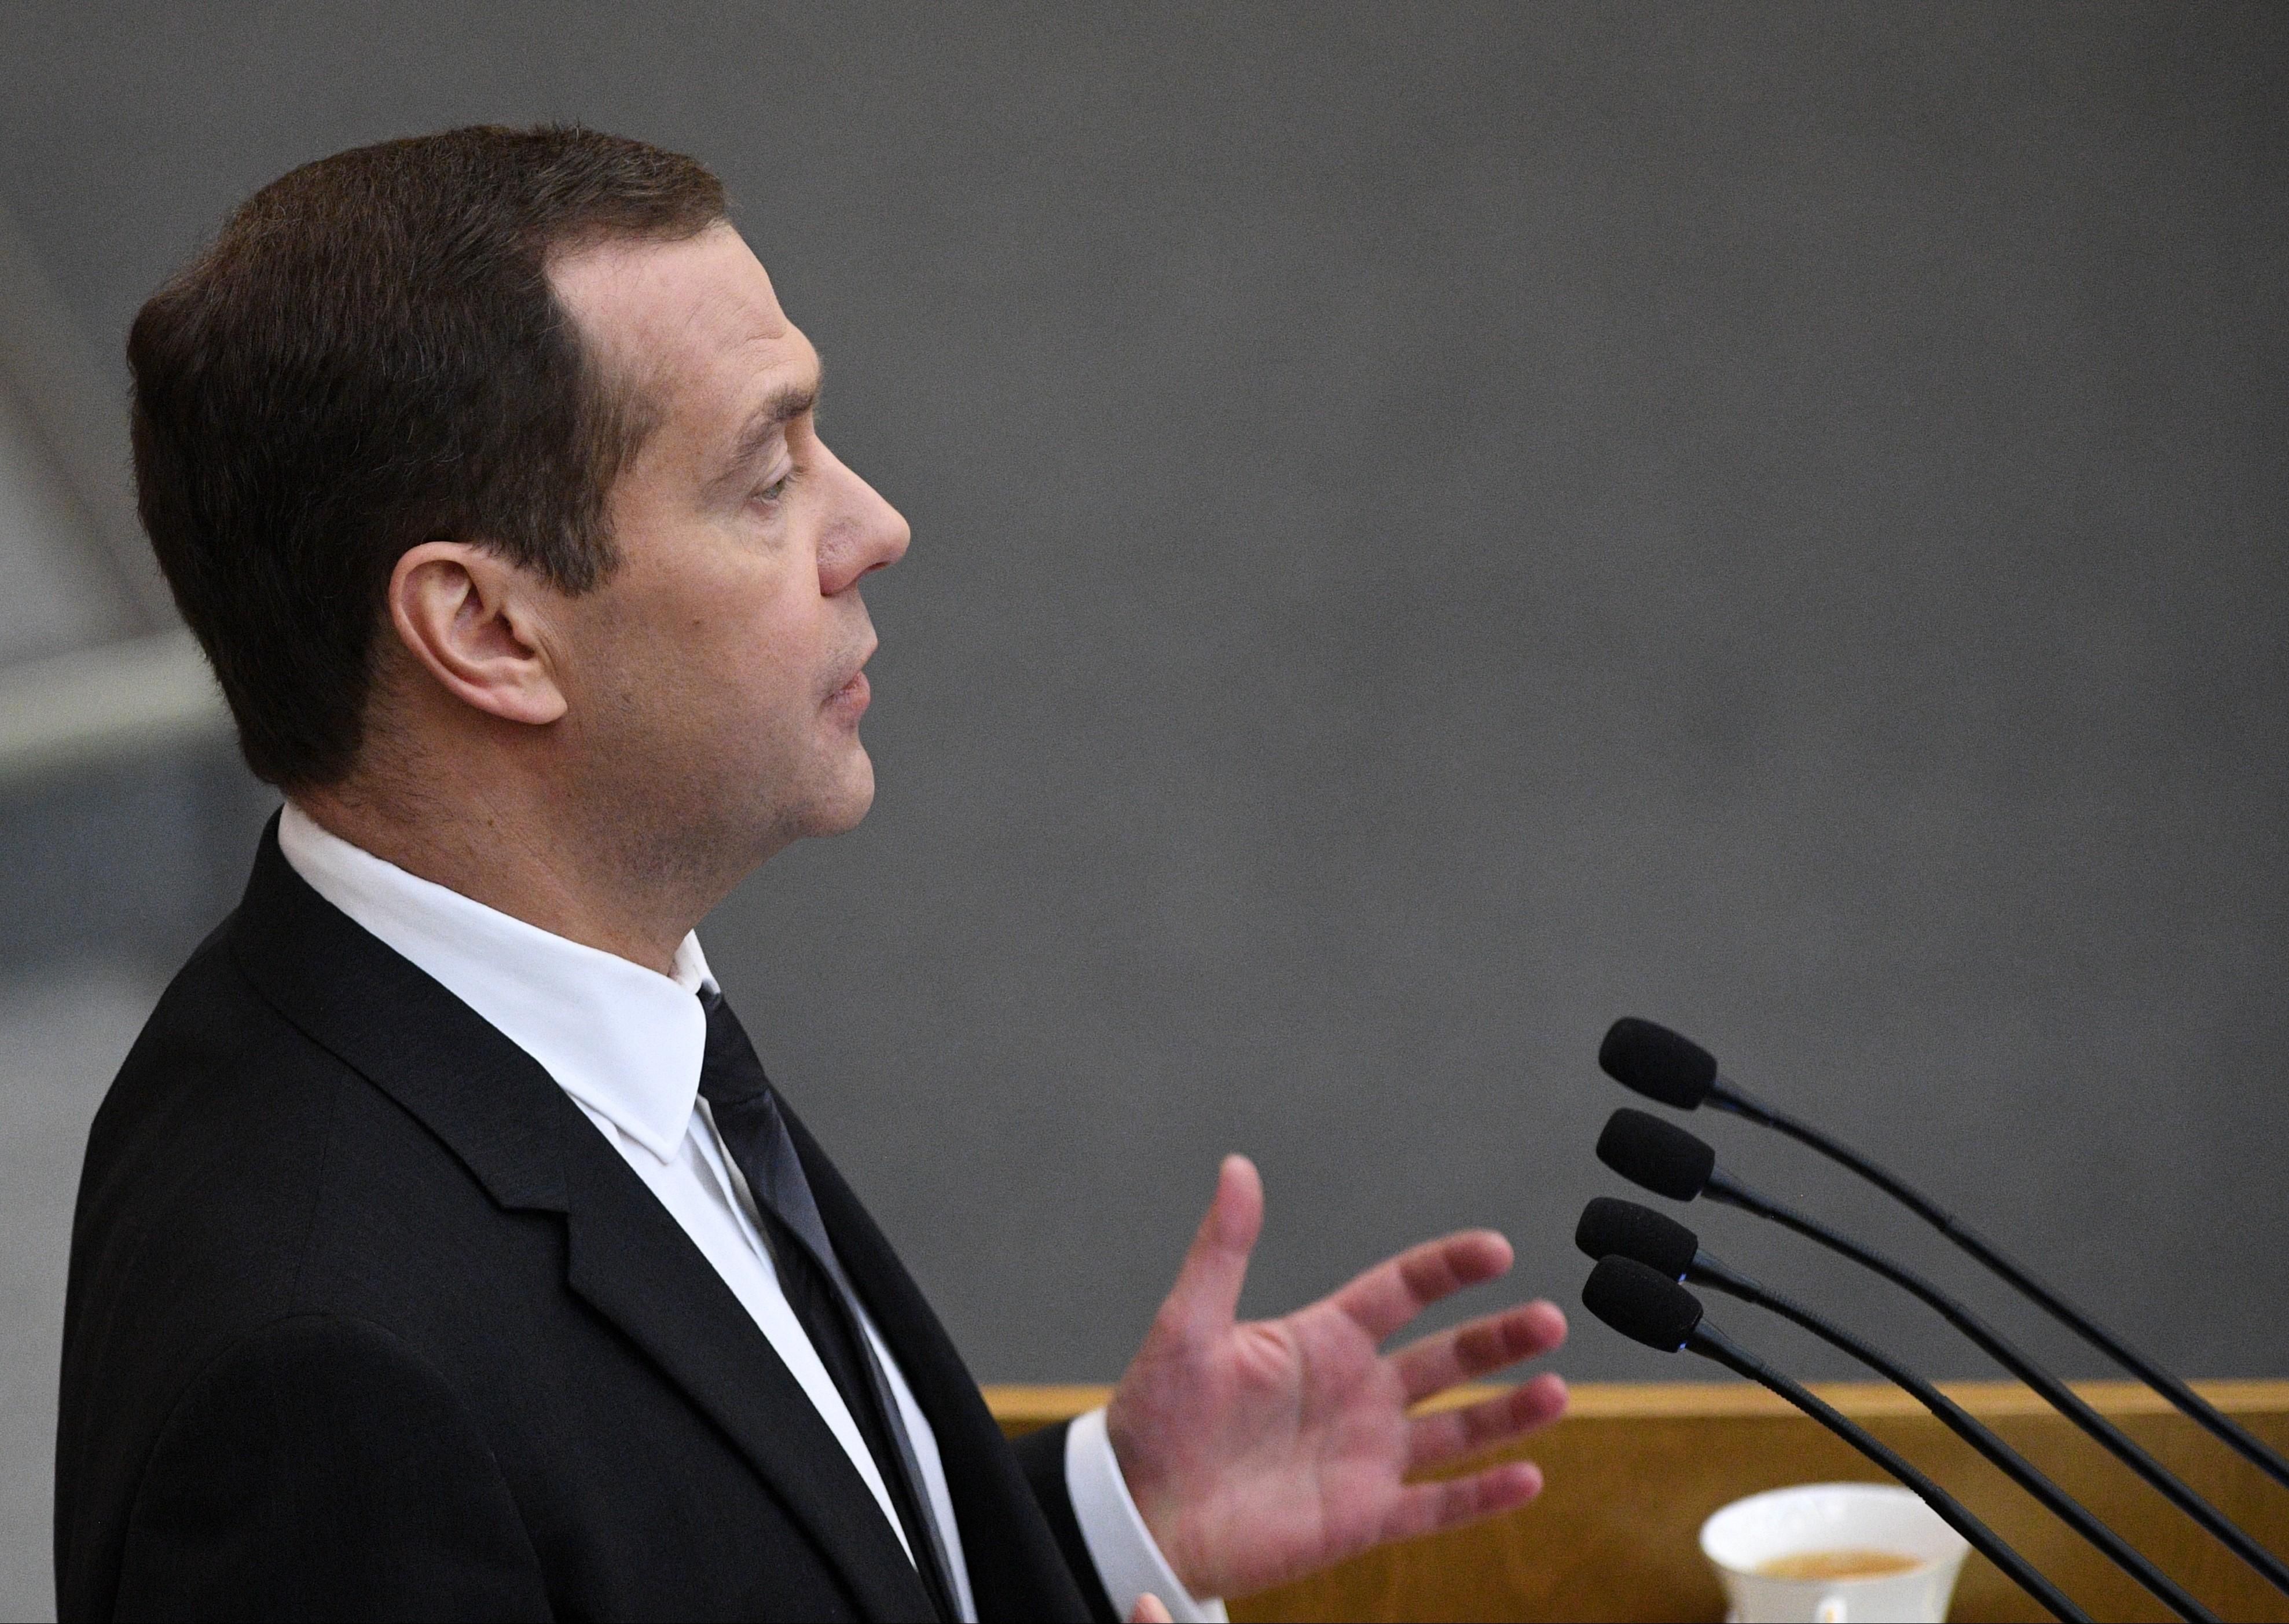 <p><span>Фото: &copy; РИА Новости/Владимир Федоренко</span></p>